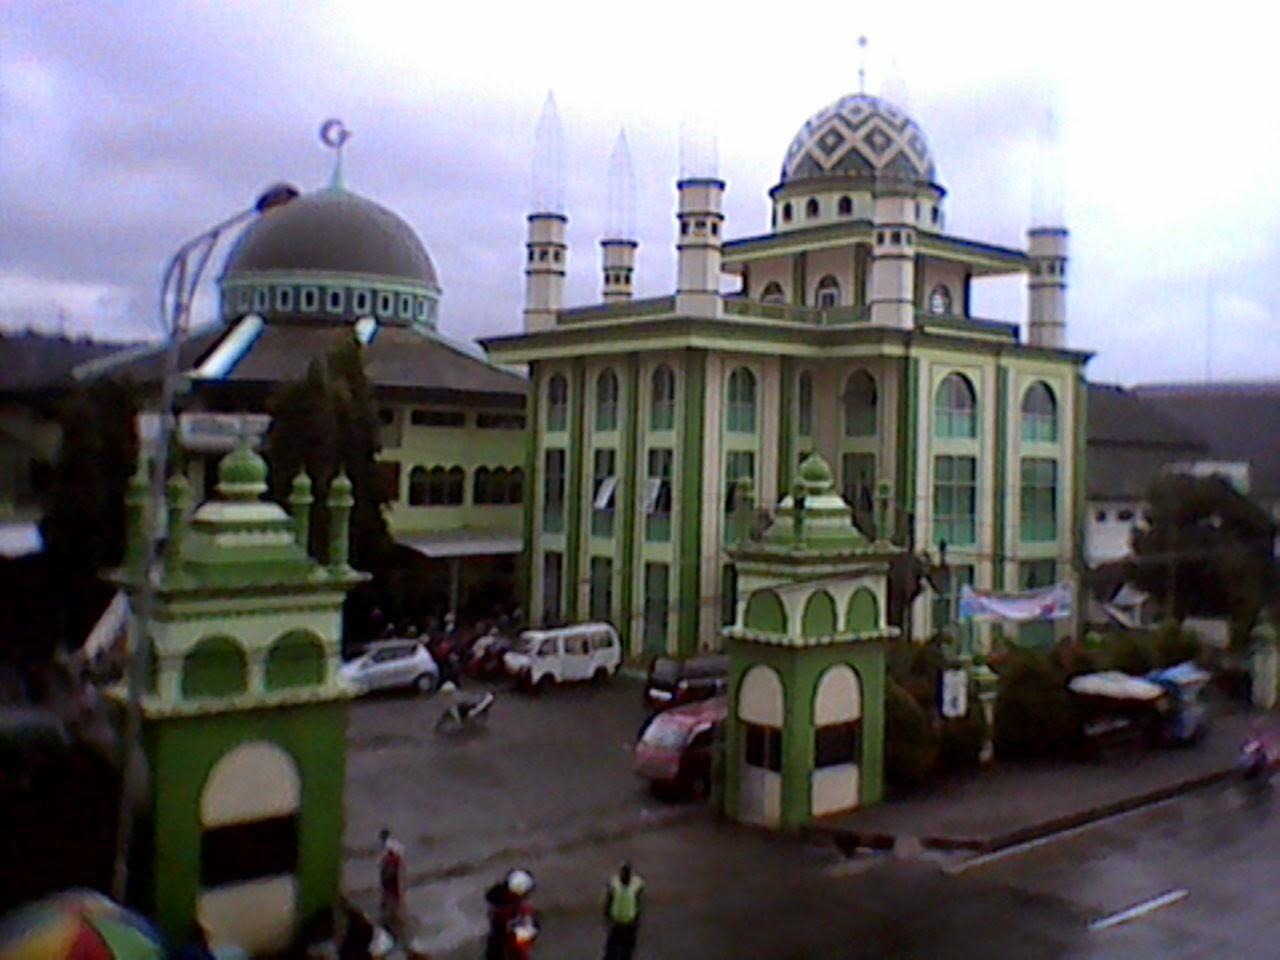 Masandhy Berbagi Info Masjid Istiqomah Ungaran 36 Masuk Wilayah Kabupaten